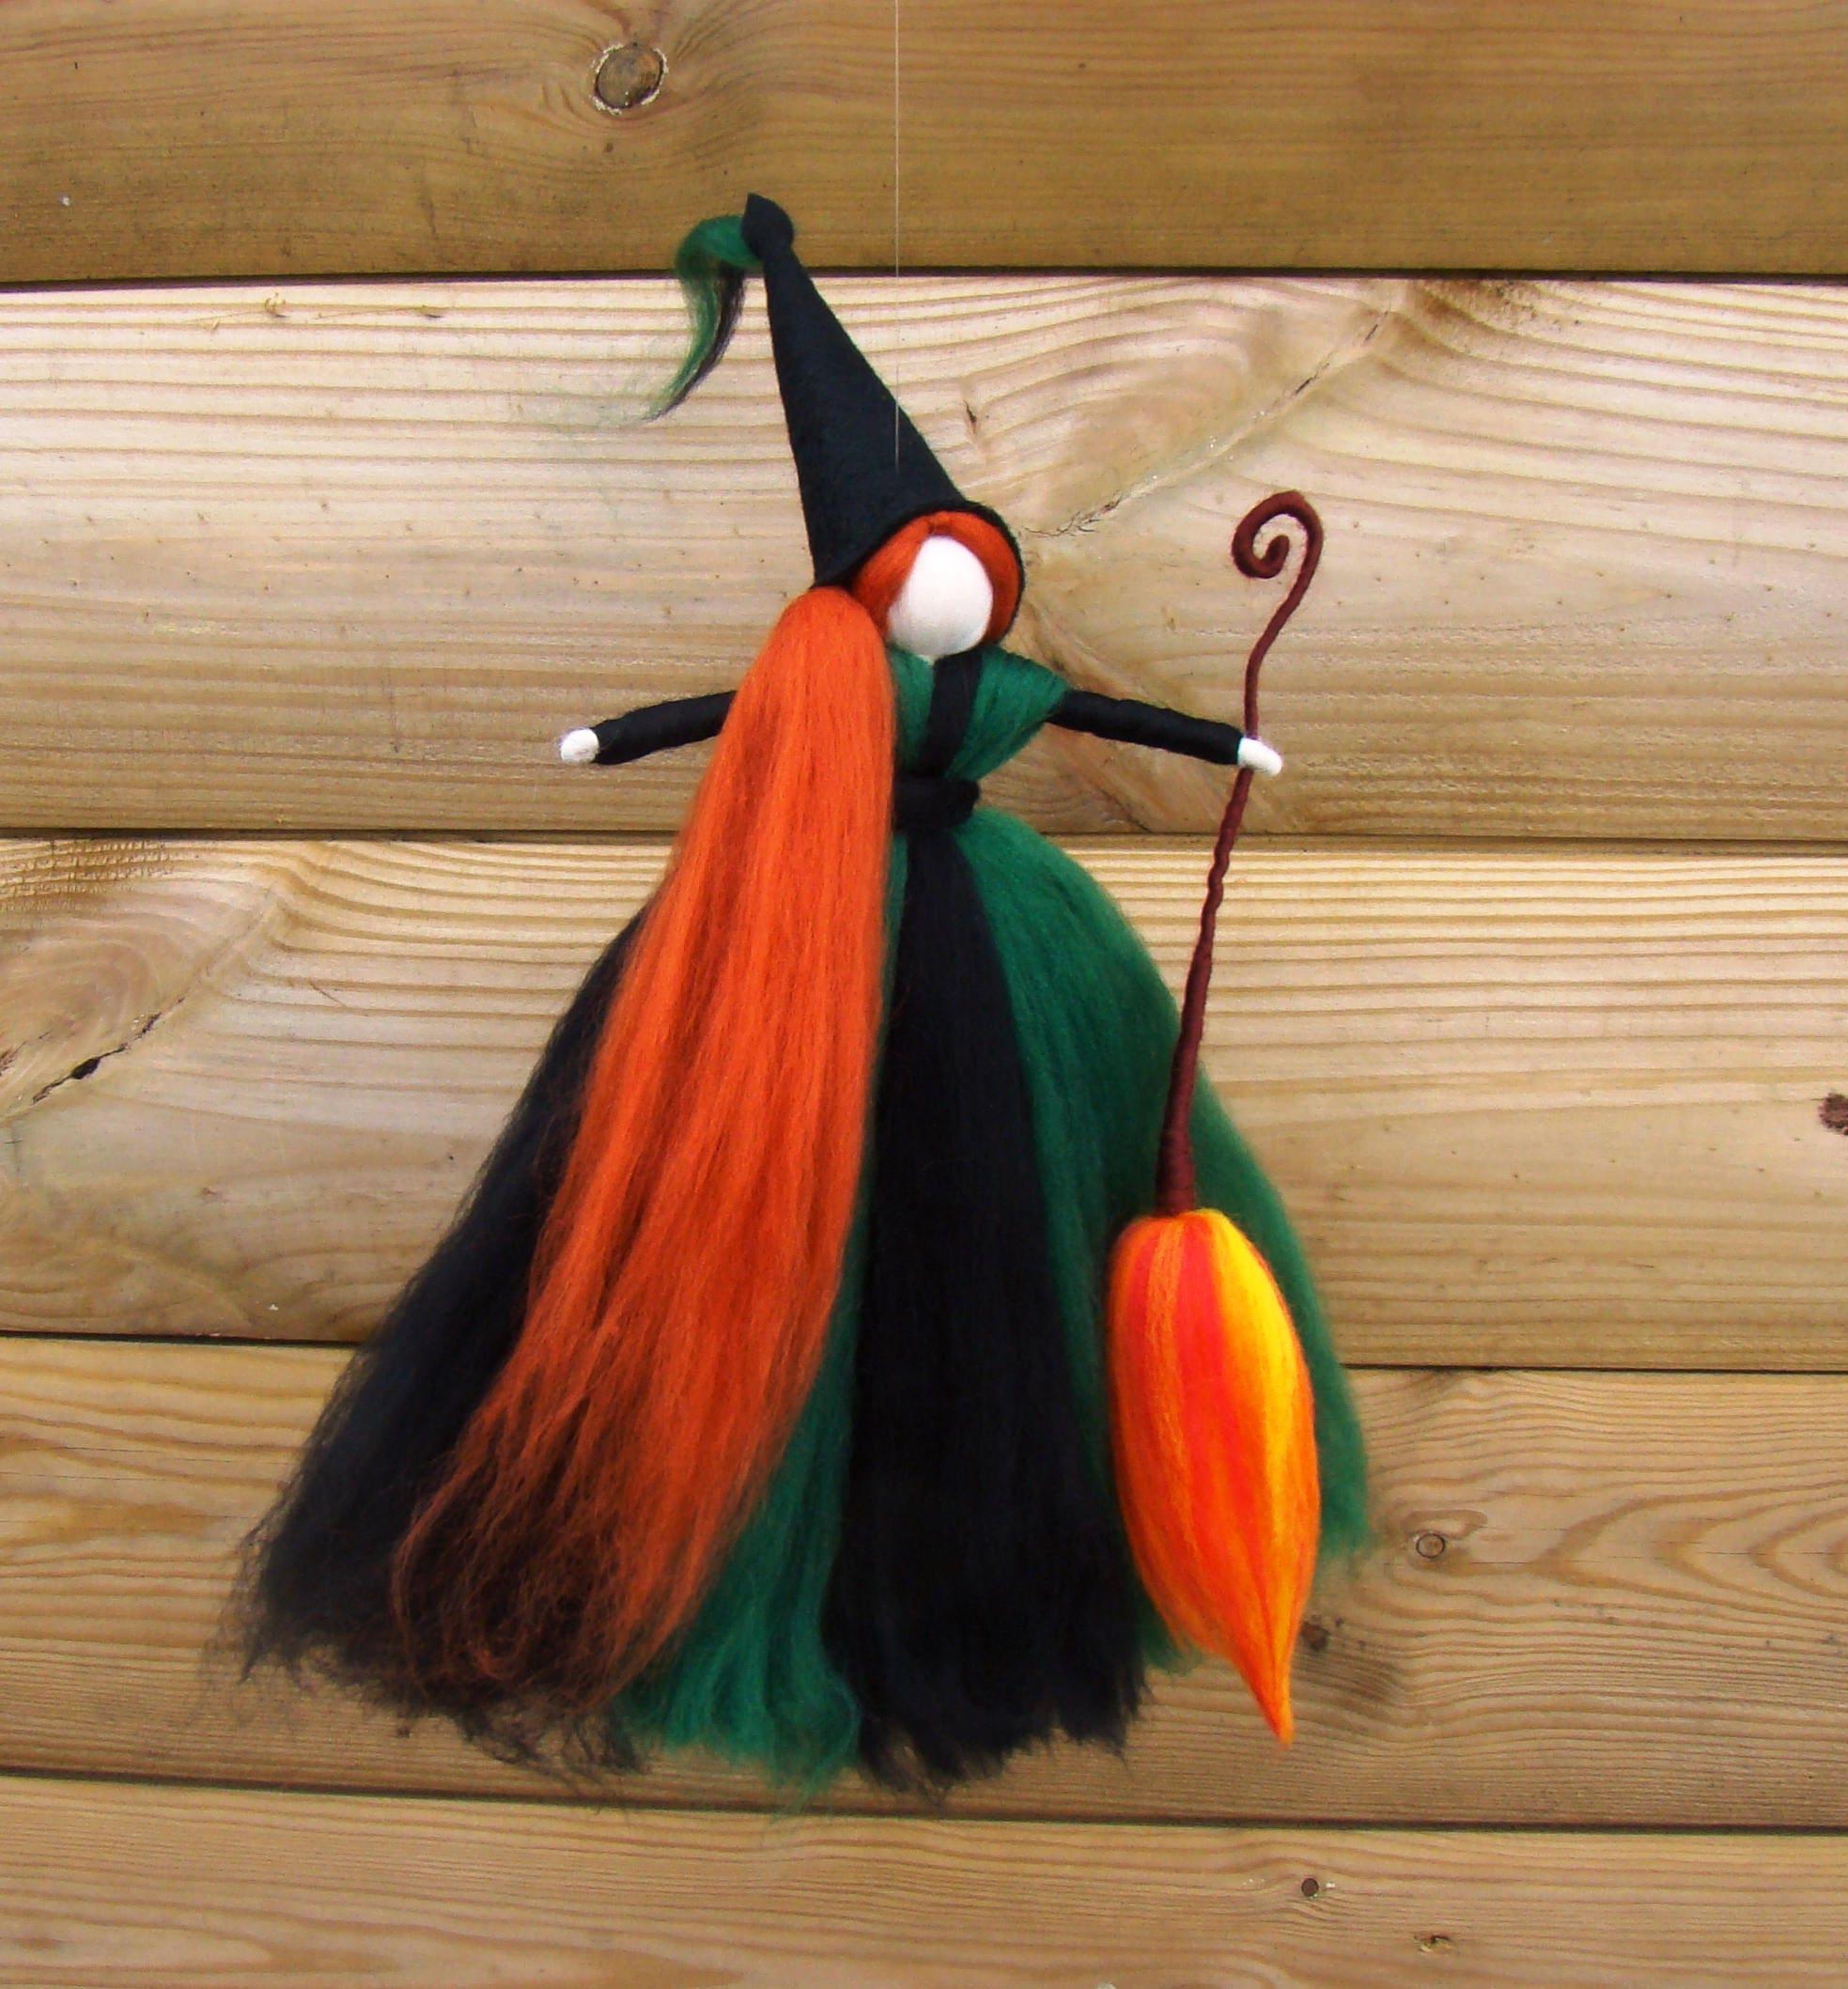 Küche Hexe Puppe grüne Hecke Hexe keltische heidnischen Hexe